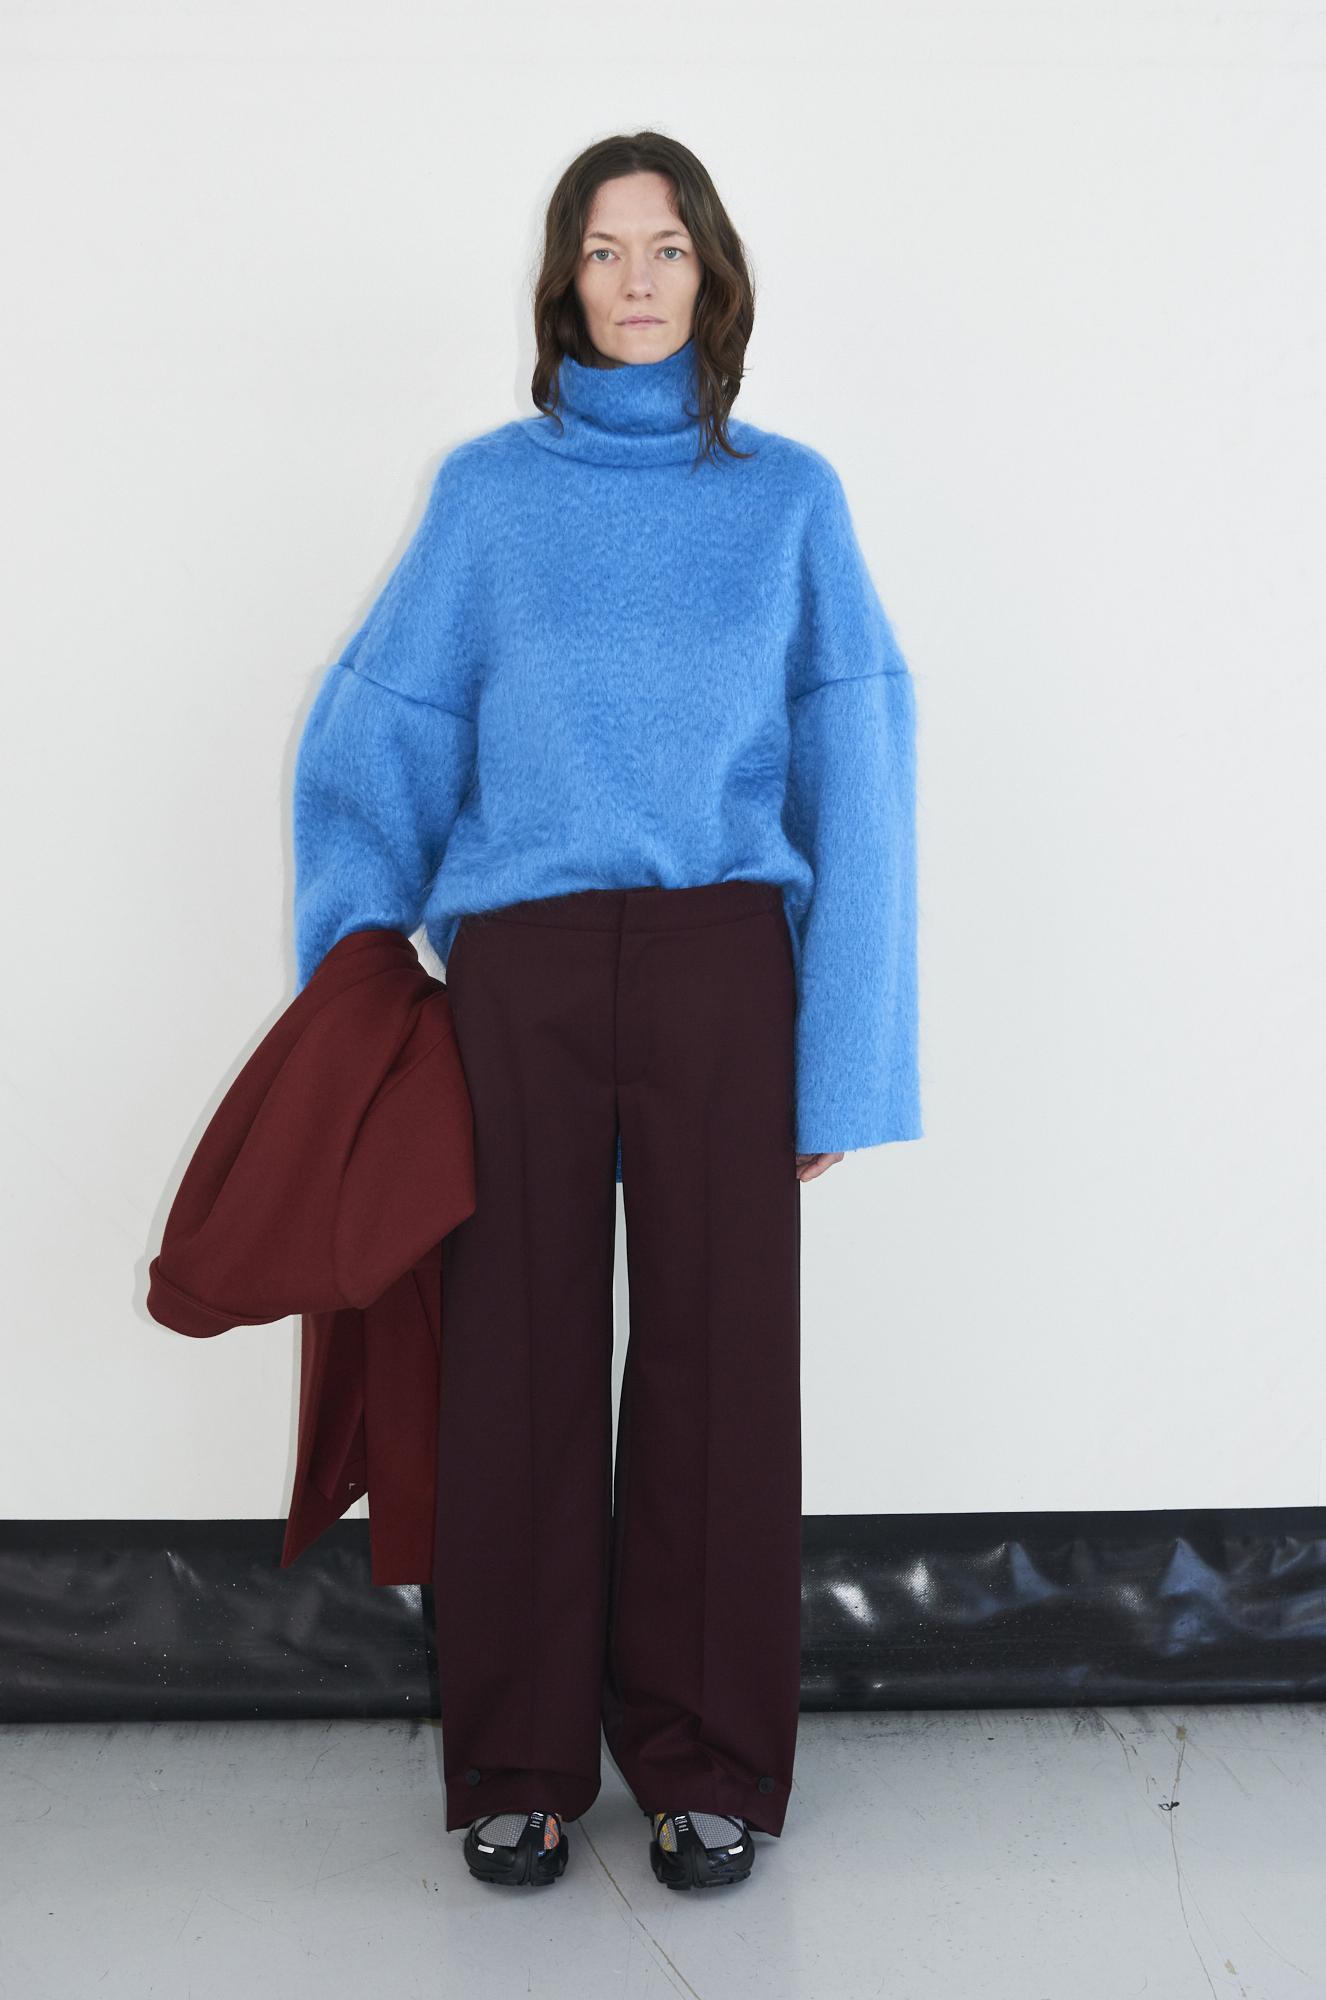 GAUCHERE Fall Winter 2021 Paris Fashion Week LOOK 1 Coat THOMINE, Top TIDUS, Pants TEKIN